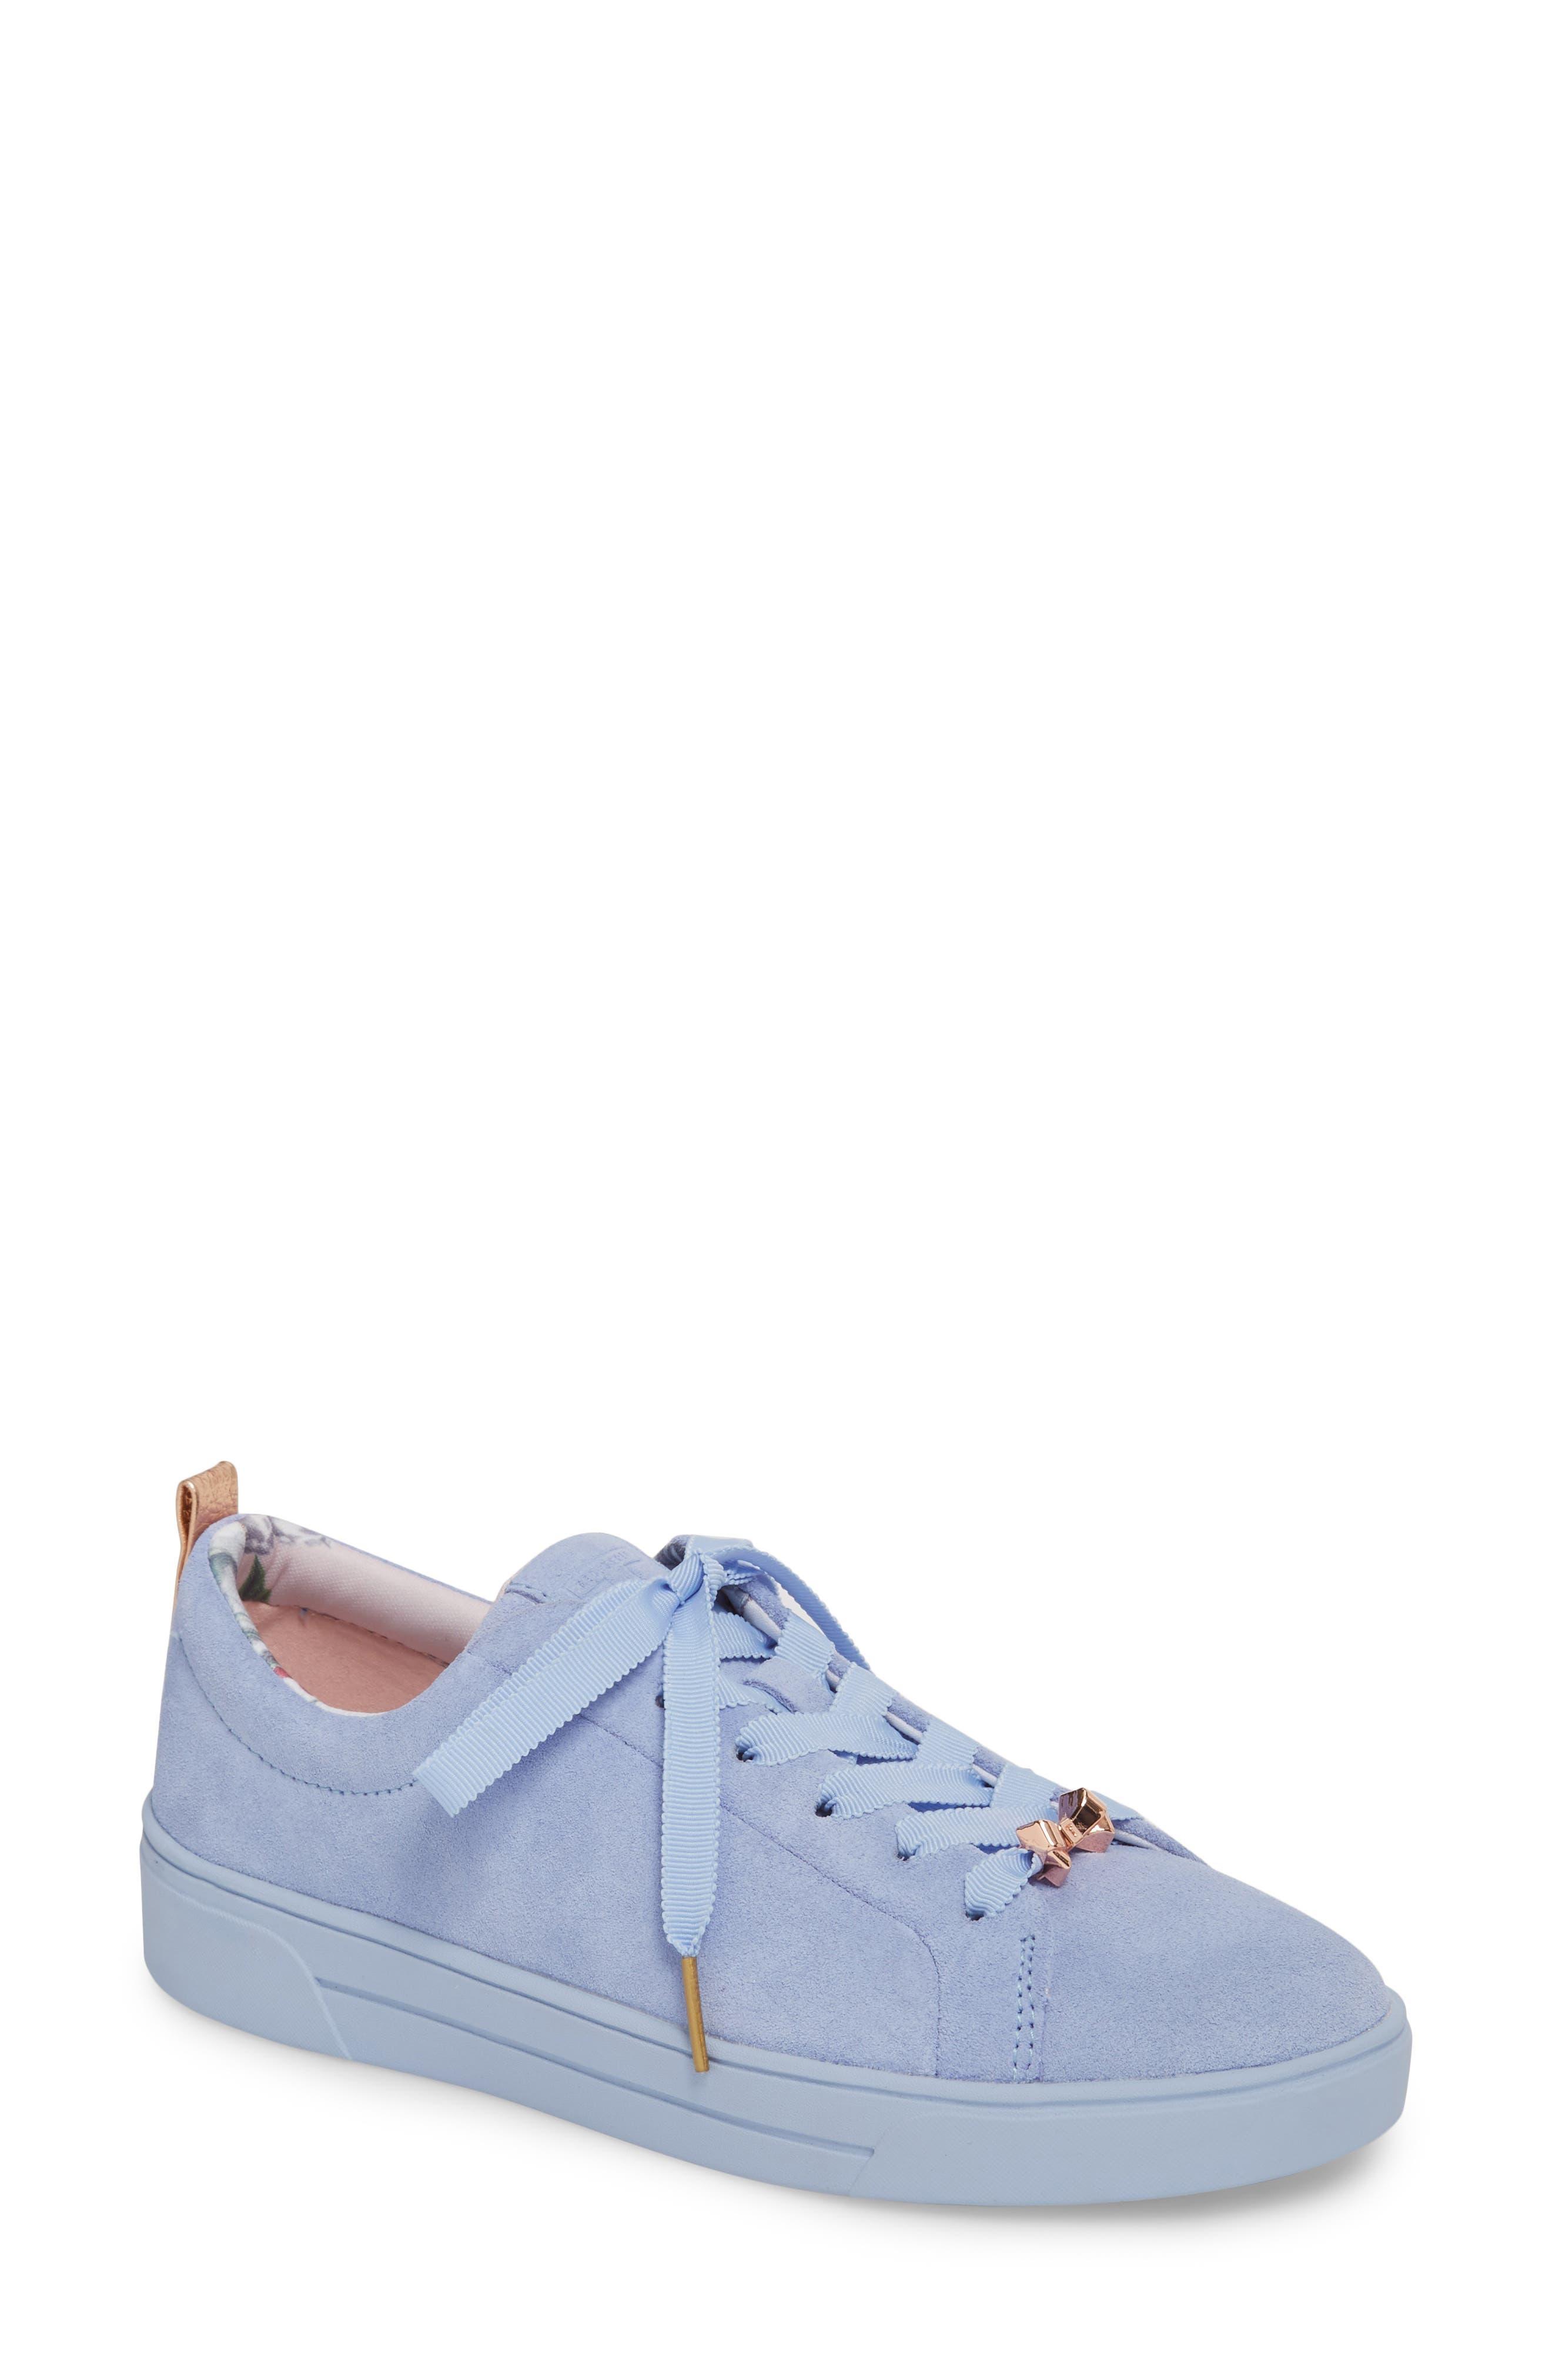 Kelleis Sneaker,                         Main,                         color, Light Blue Suede